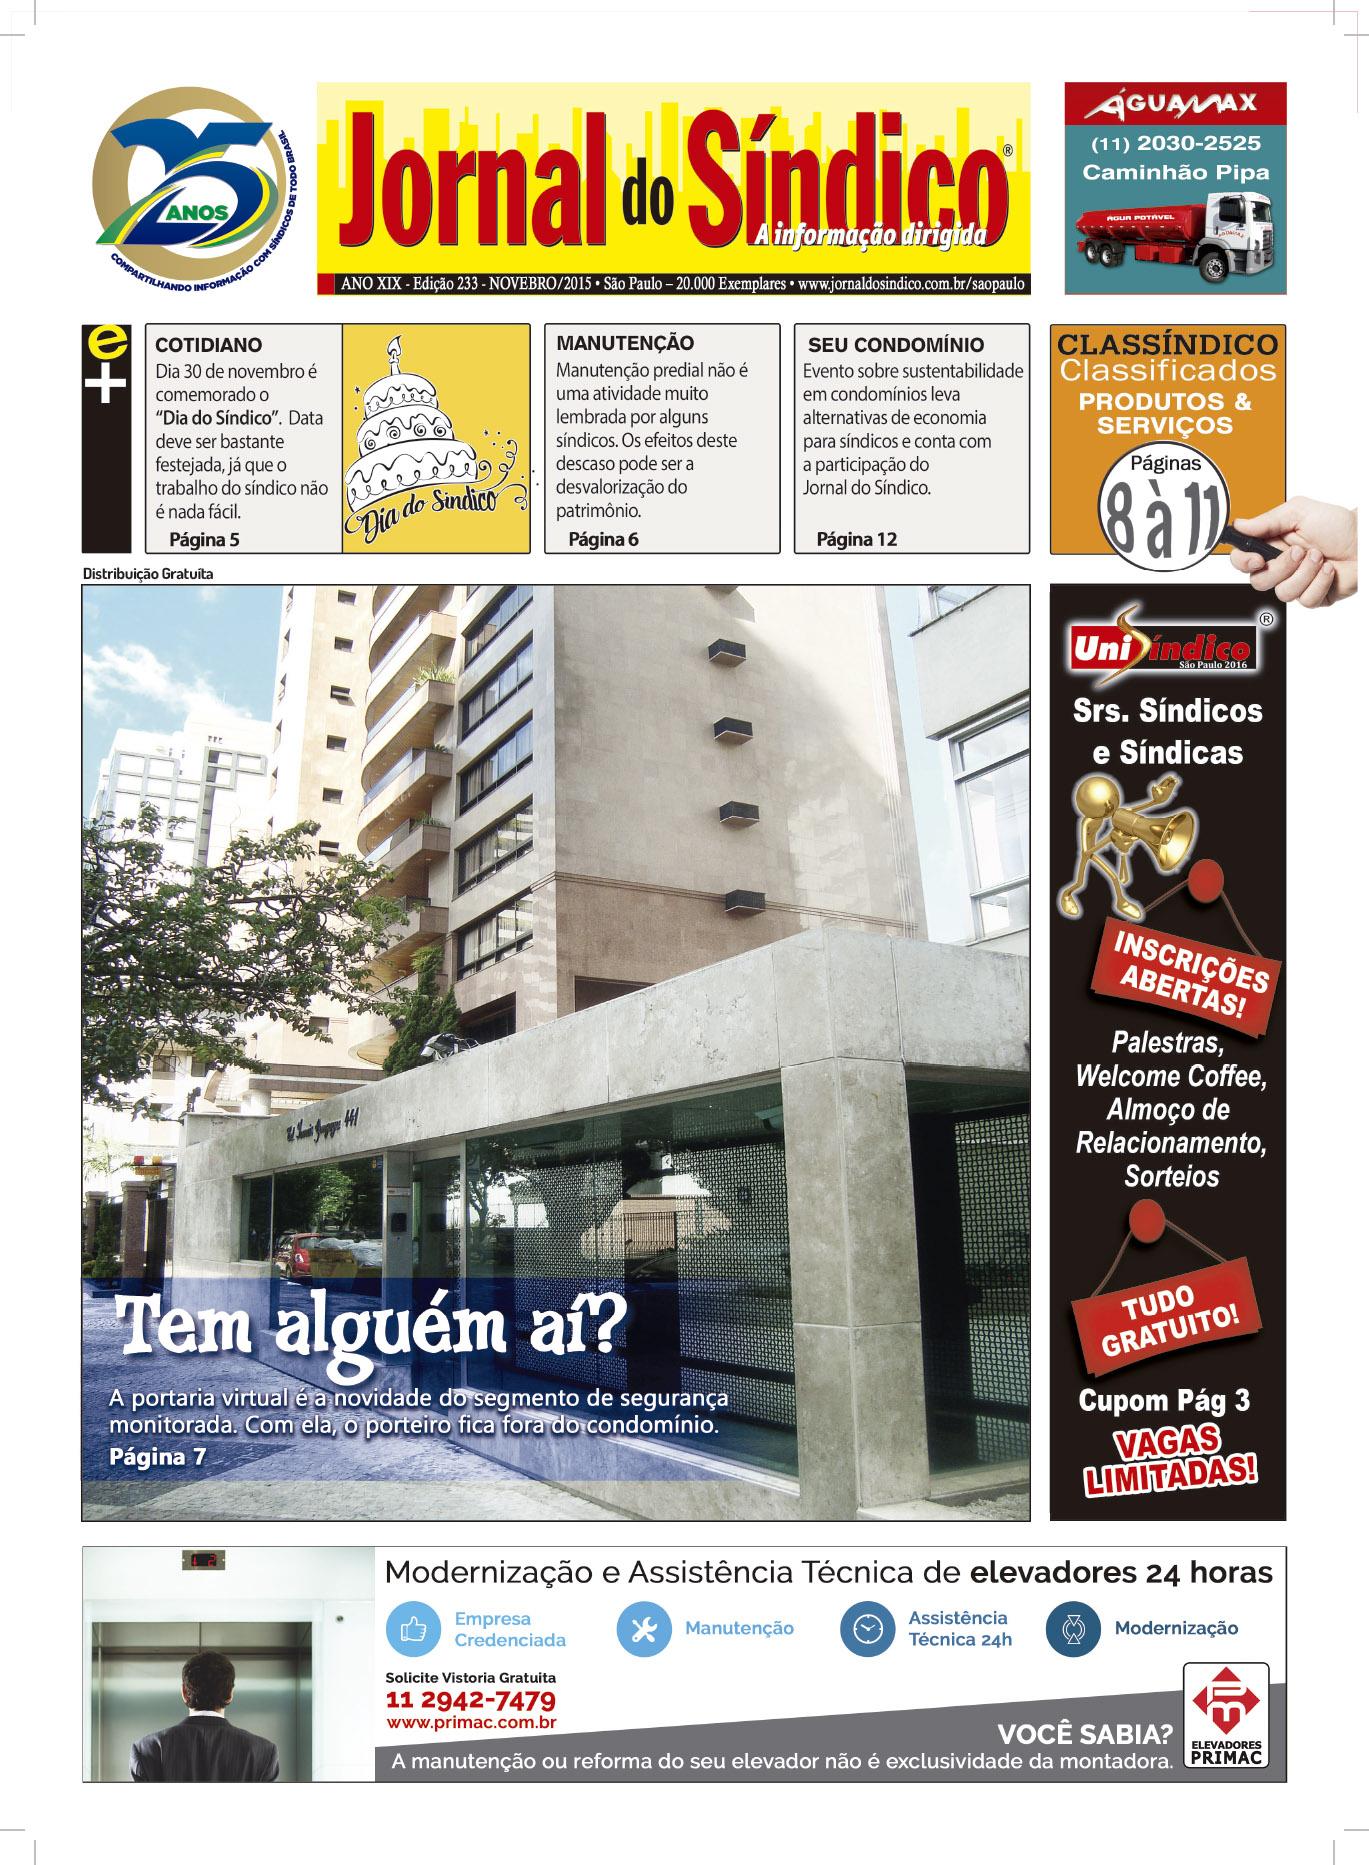 Jornal do Sindico BCKP - Edic 233.indd